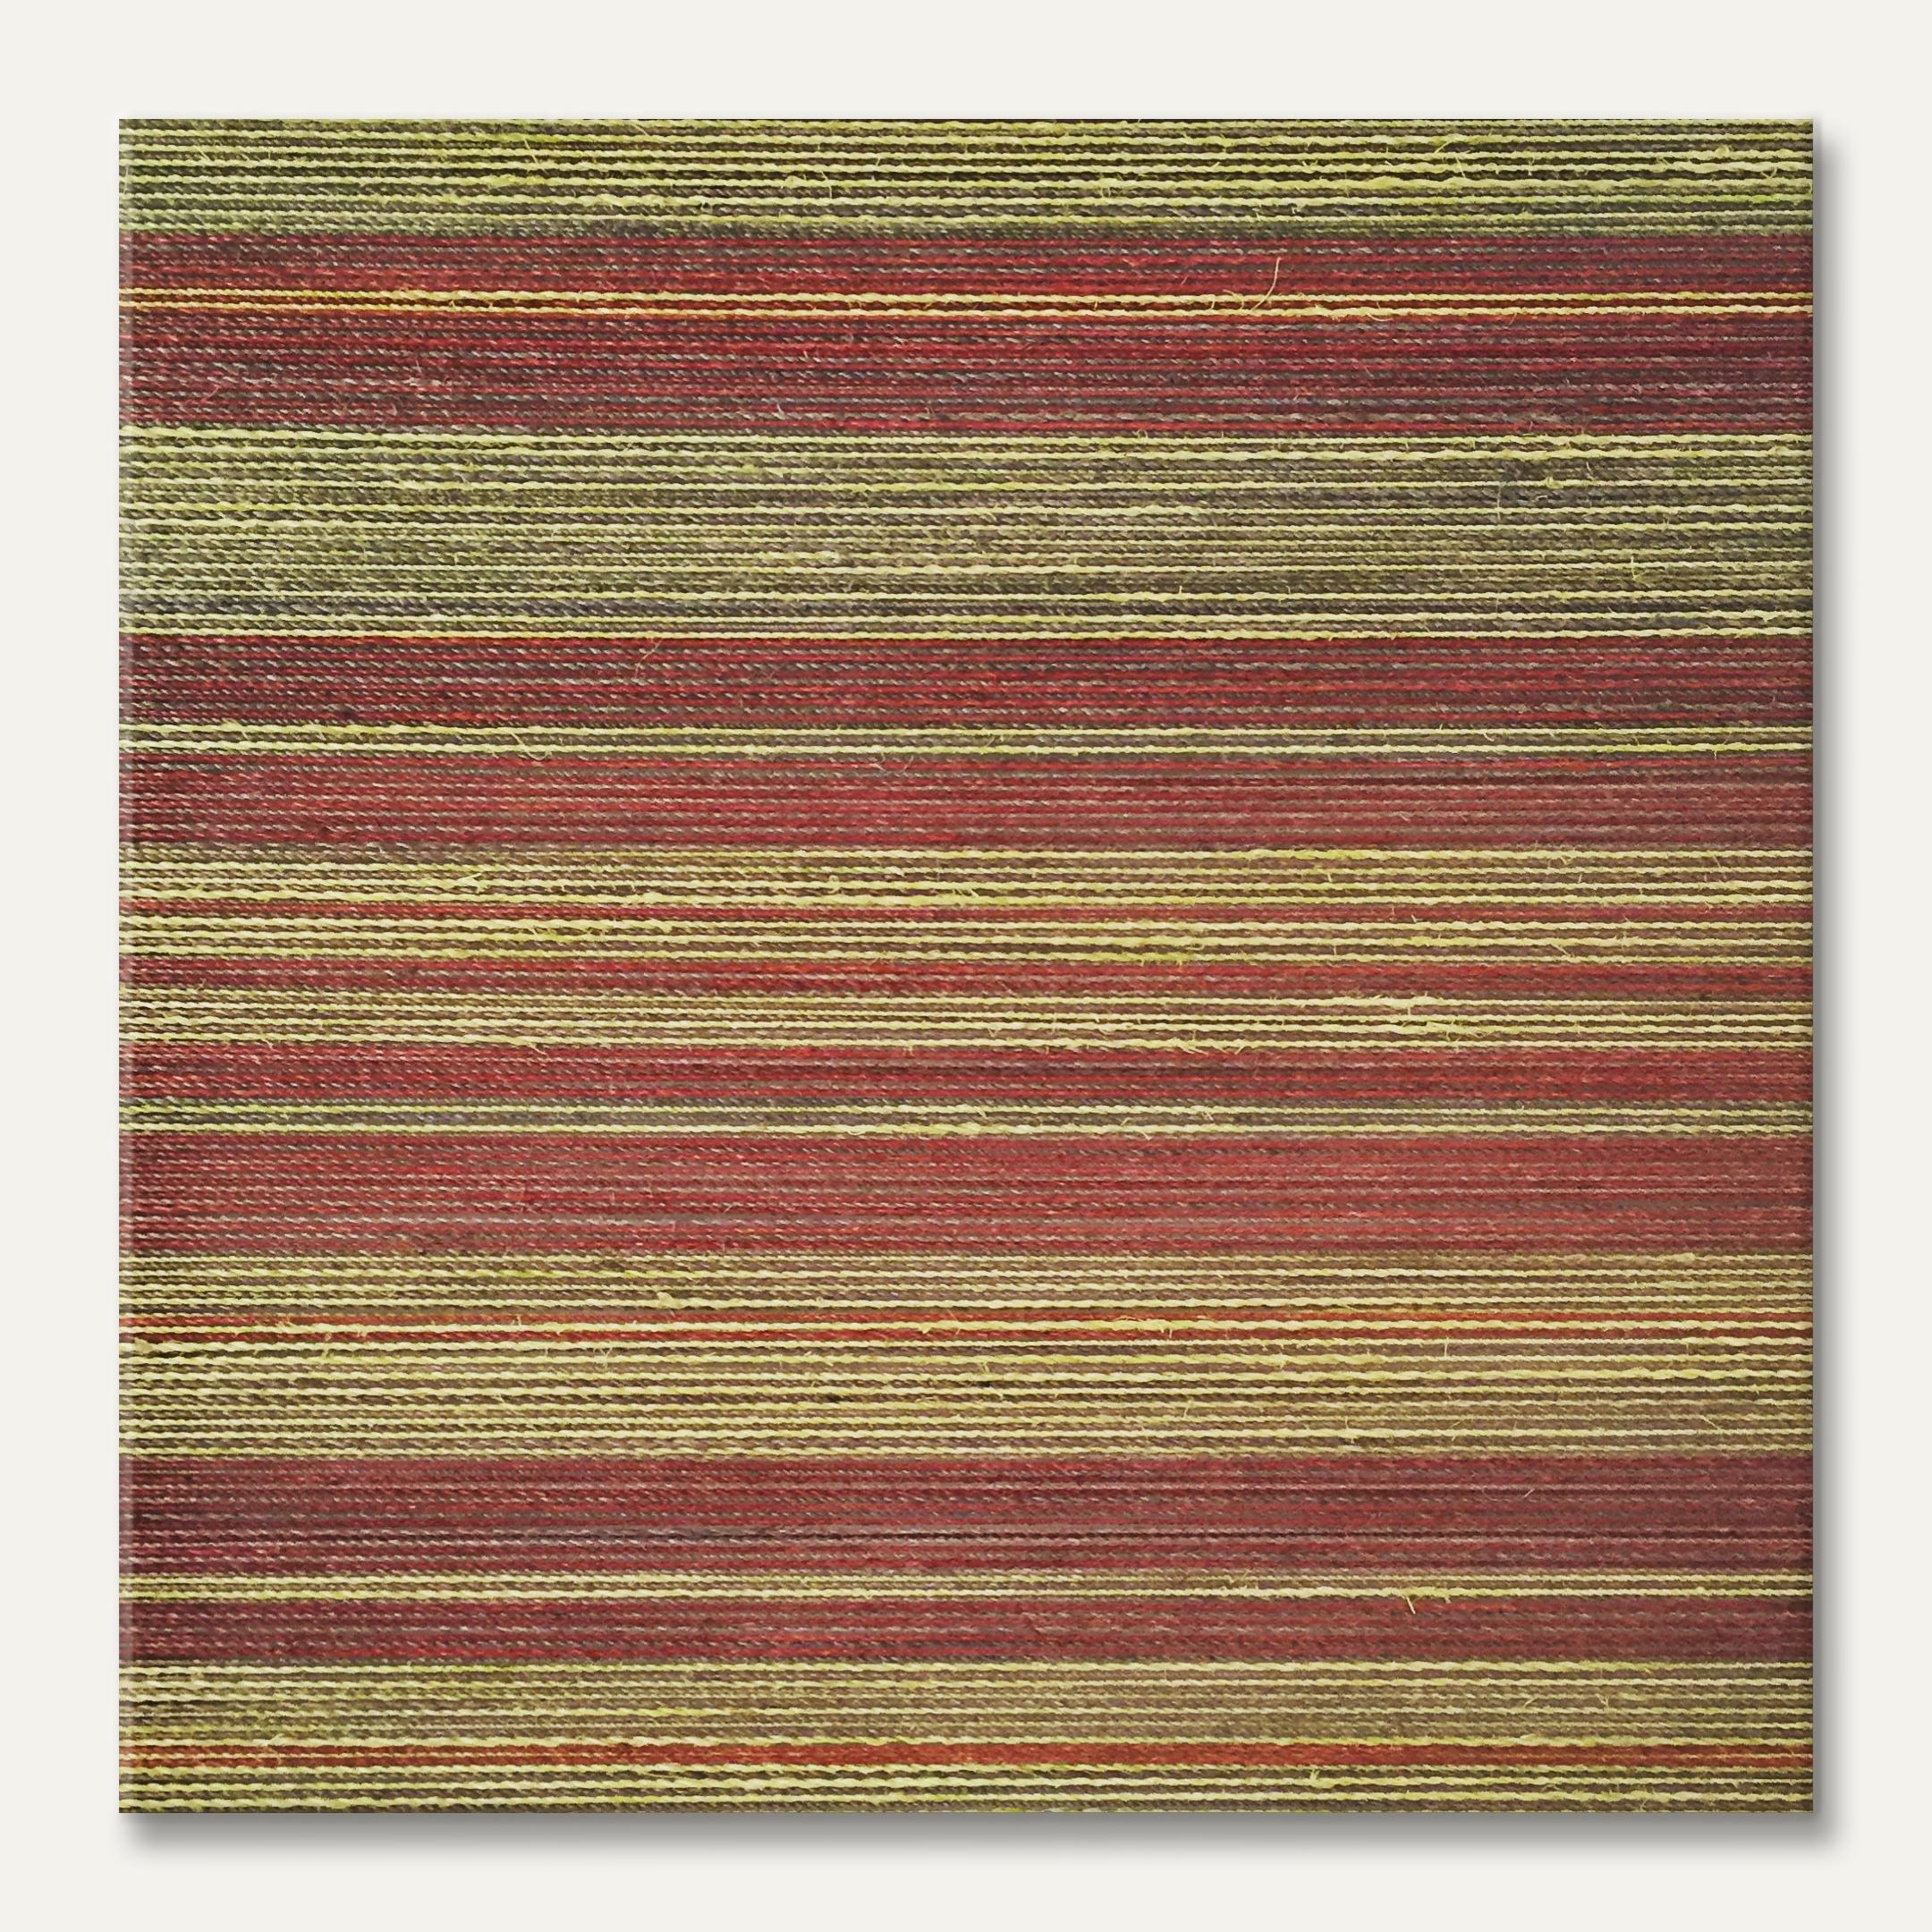 Untitled Pita Maguey 2, (natural fiber, minimalist, latin america, textile)